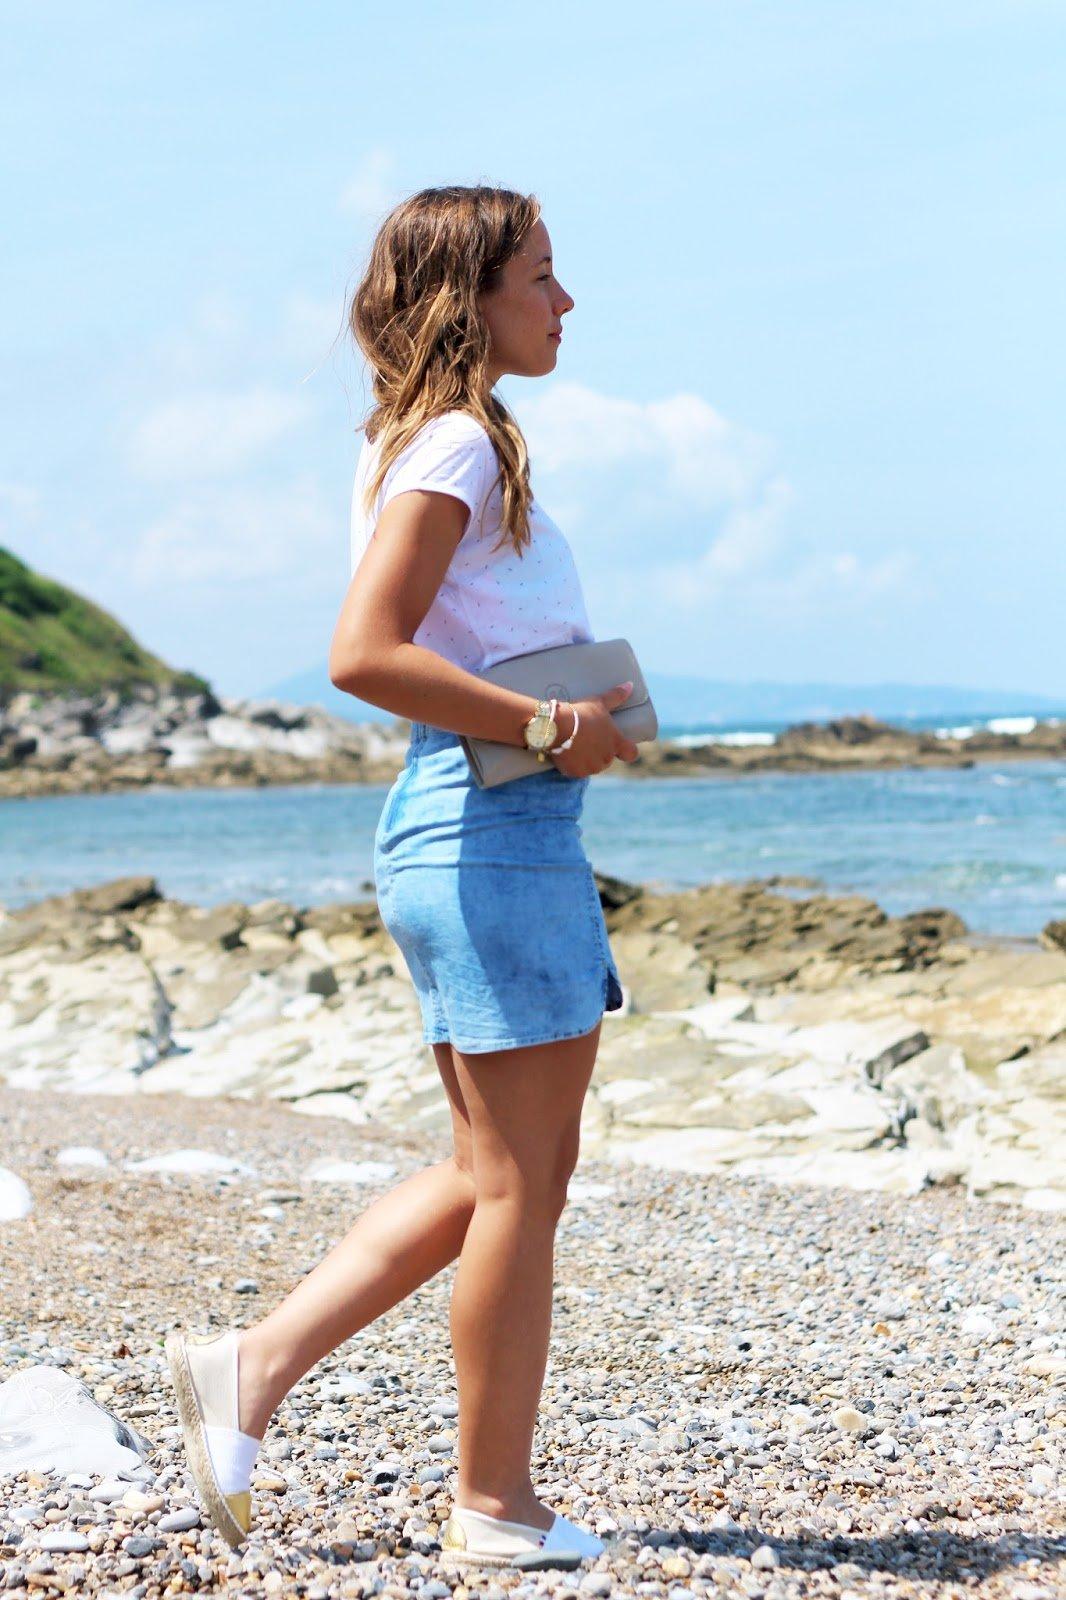 Tenue de plage côte basque